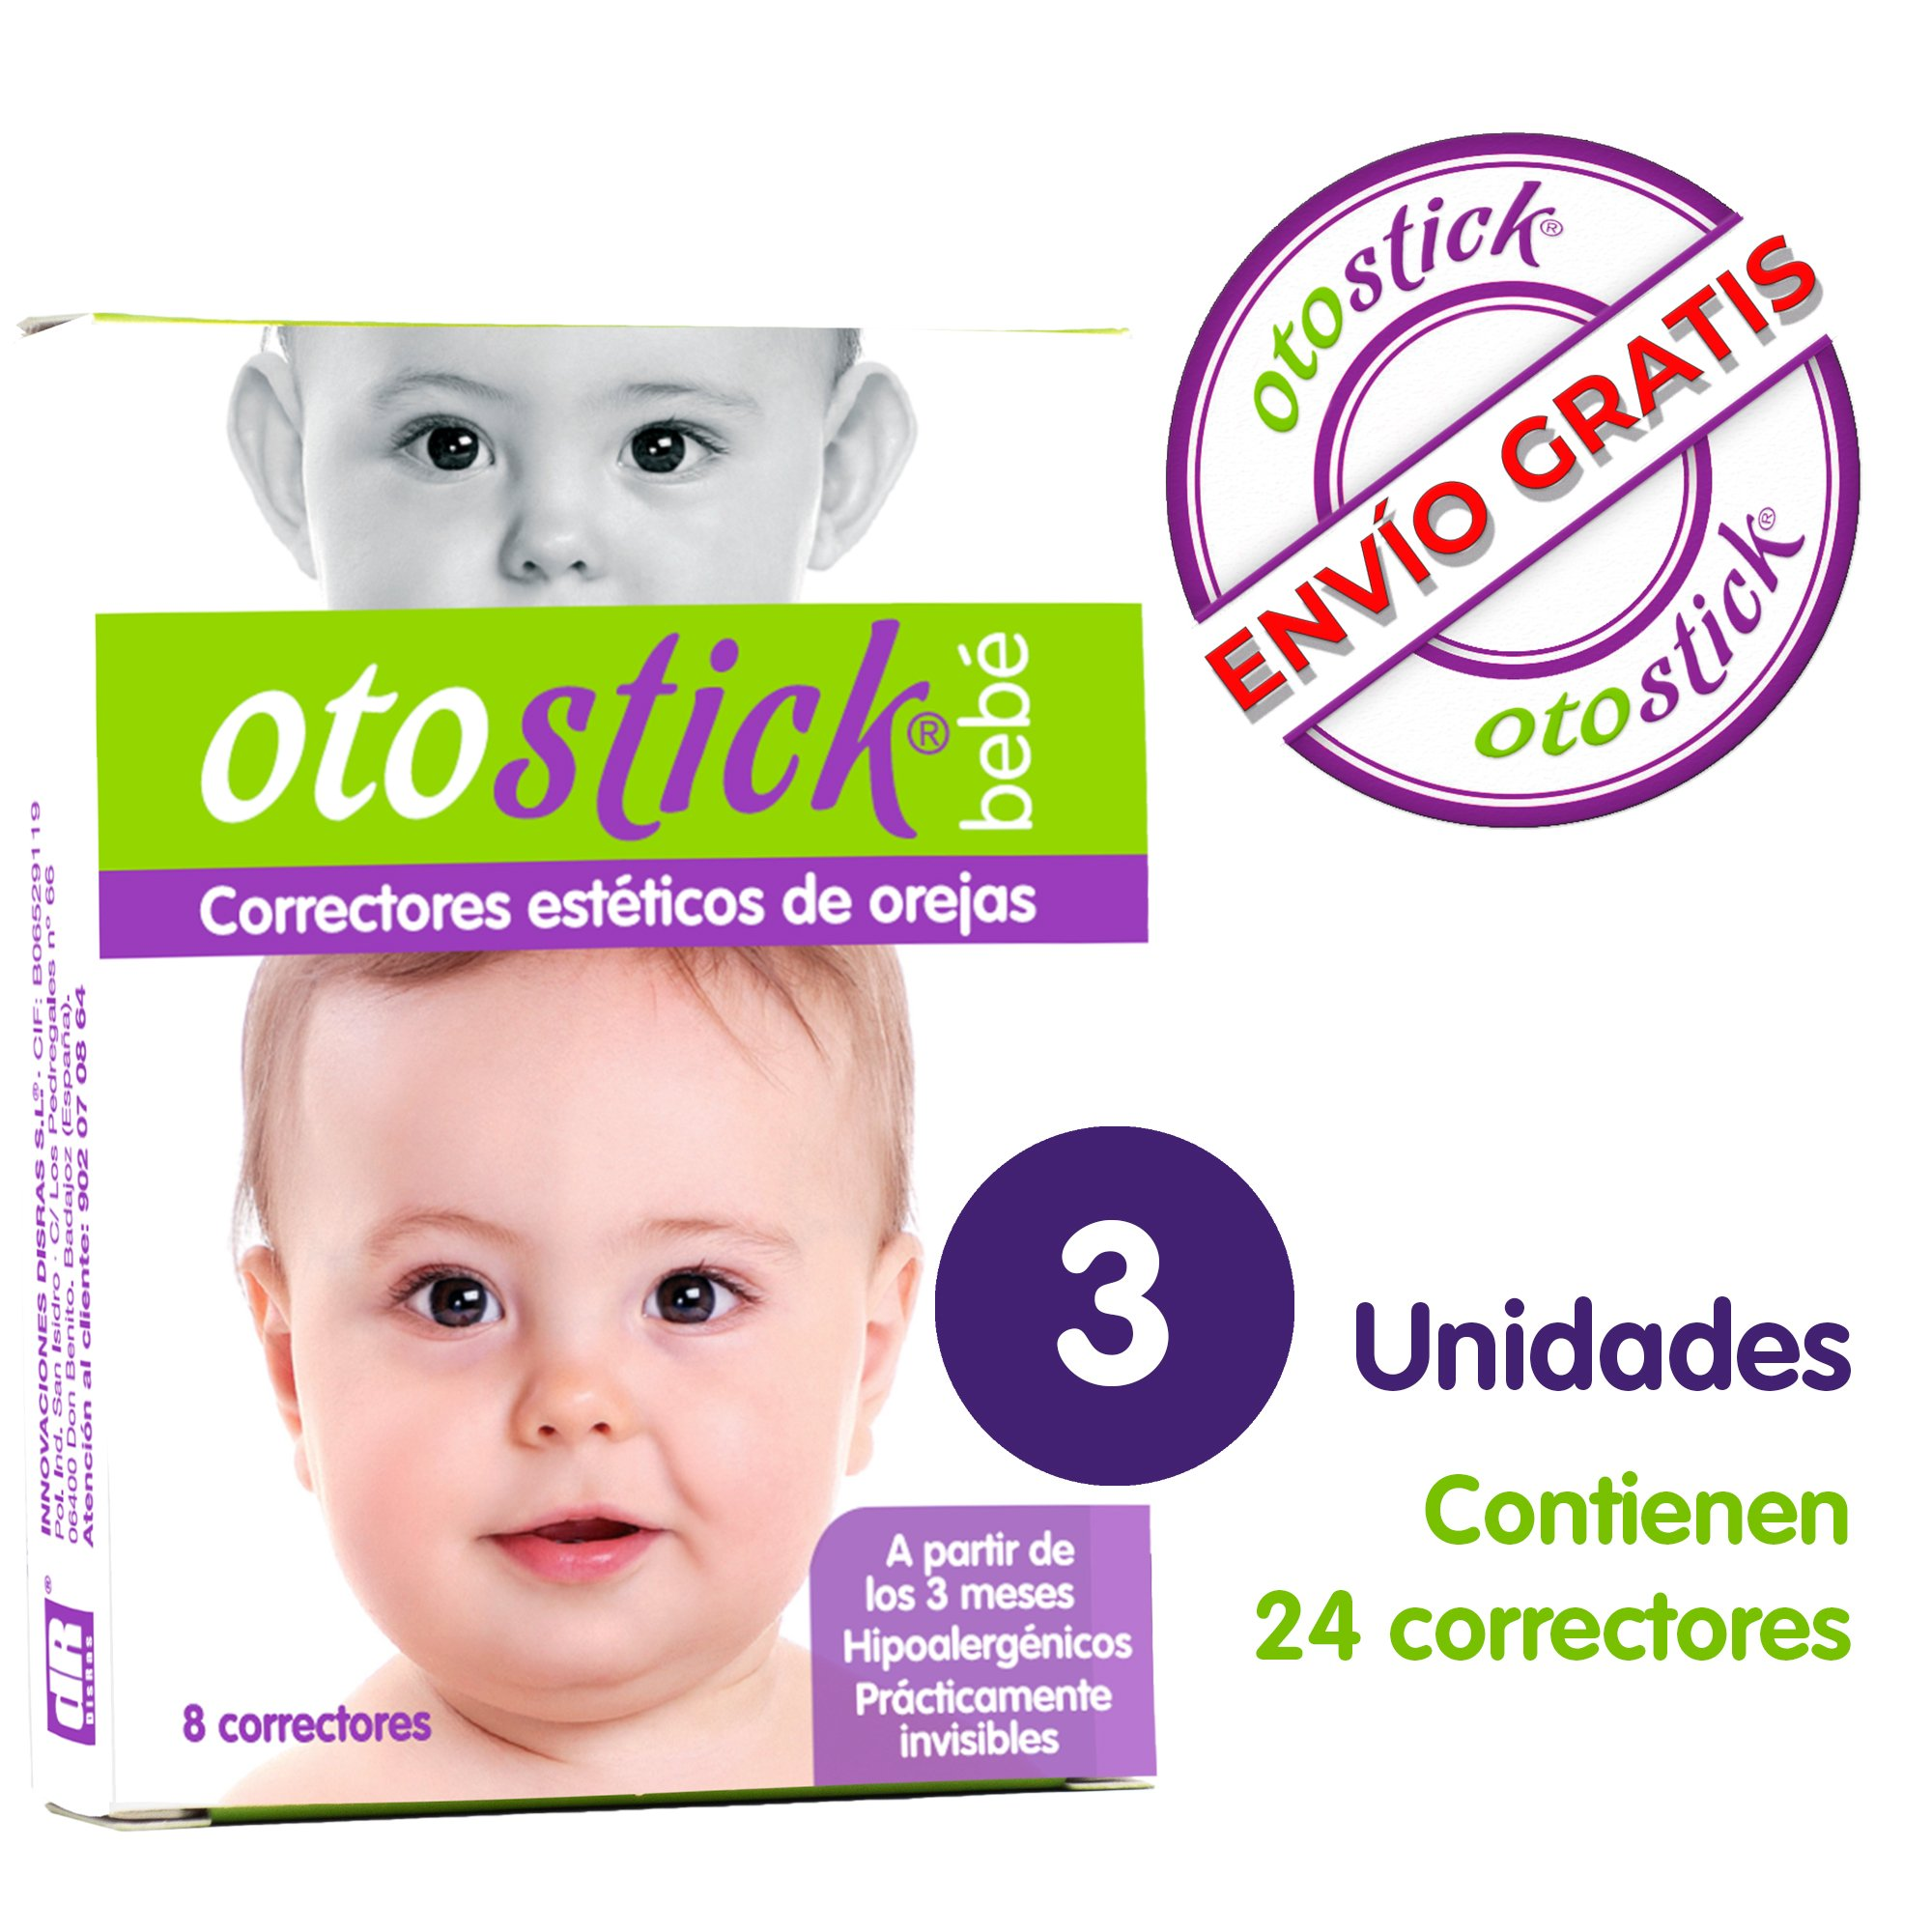 otostick_3_españa